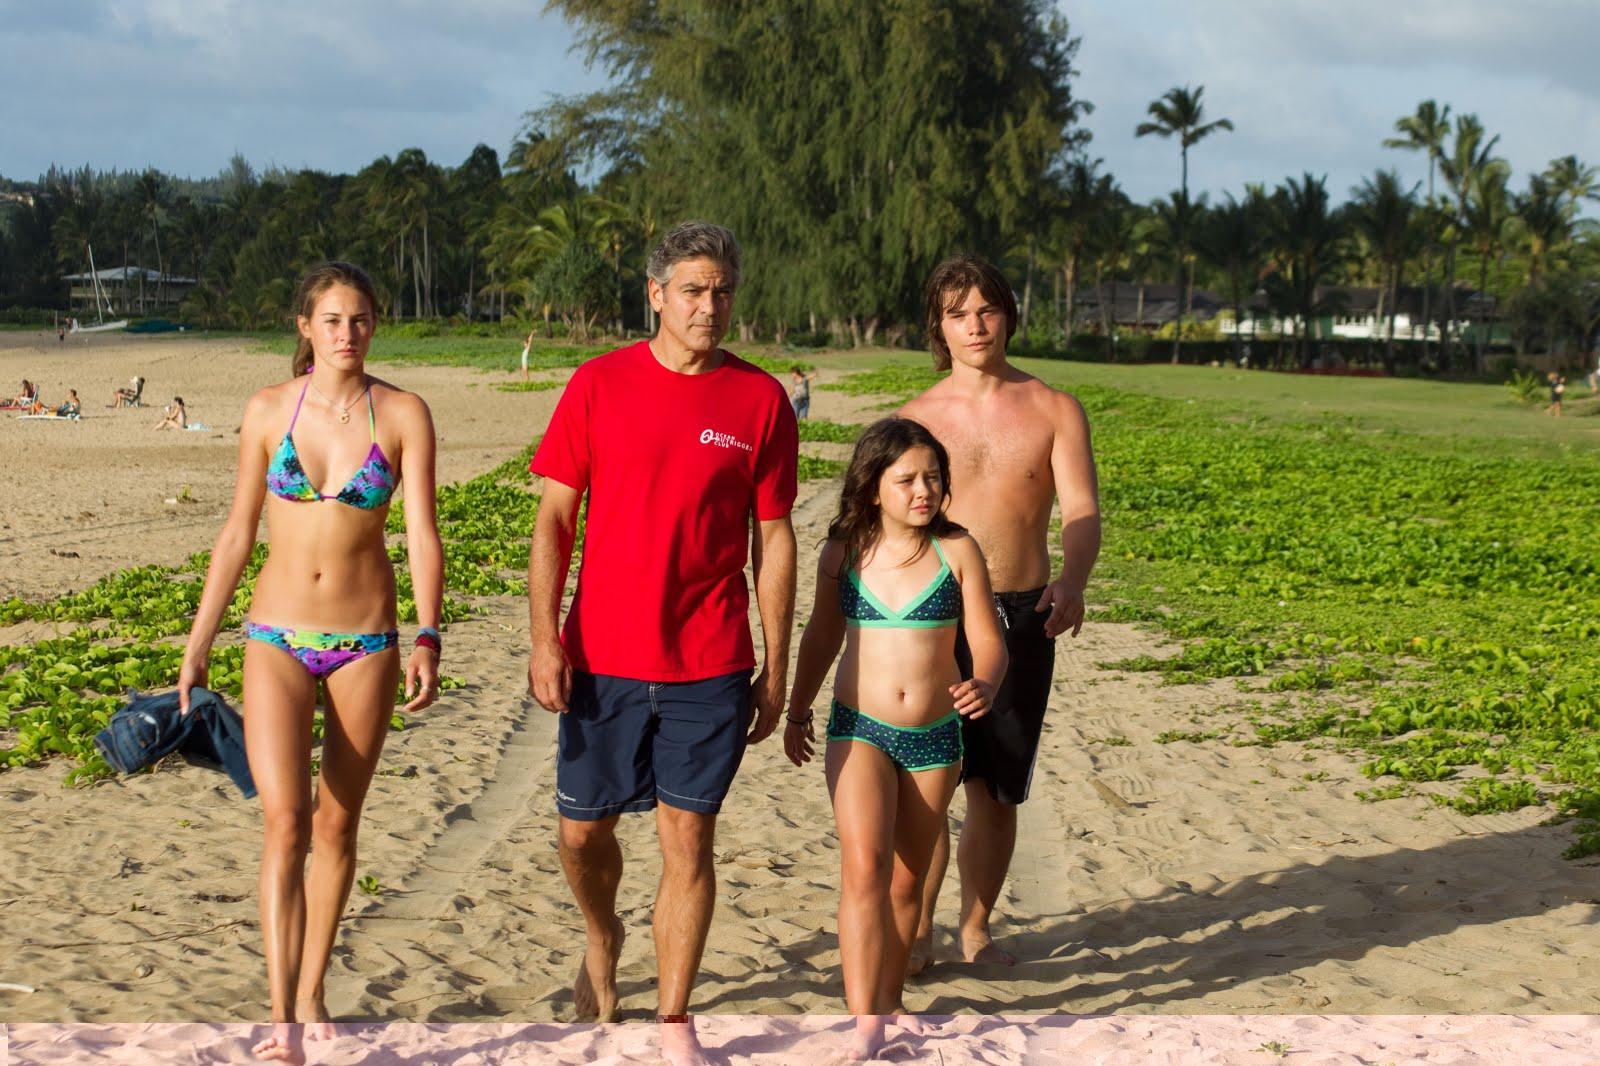 http://1.bp.blogspot.com/-v1m7bWzgk7U/Ts0Oxu3H-jI/AAAAAAAAANQ/0XTEVXB_g4A/s1600/Clooney_and_kids_pic.jpg